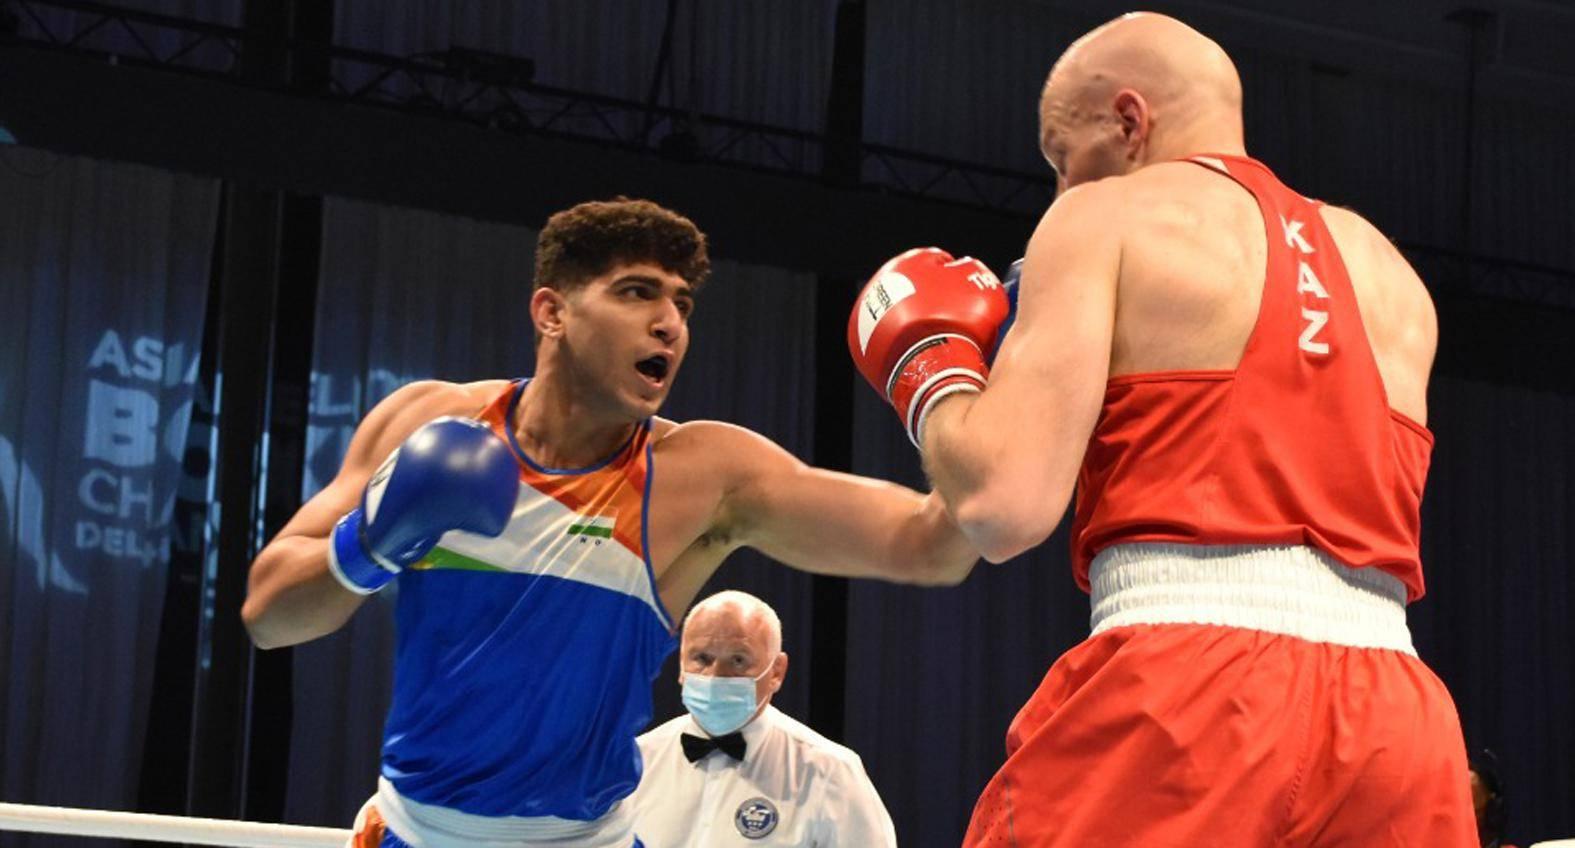 Asian Boxing Championship: India's Sanjeet Kumar wins gold medal   ஆசிய குத்துச்சண்டை சாம்பியன்ஷிப்: இந்தியாவின் சஞ்சீத் குமார் தங்கப்பதக்கம் வென்றார்  _40.1